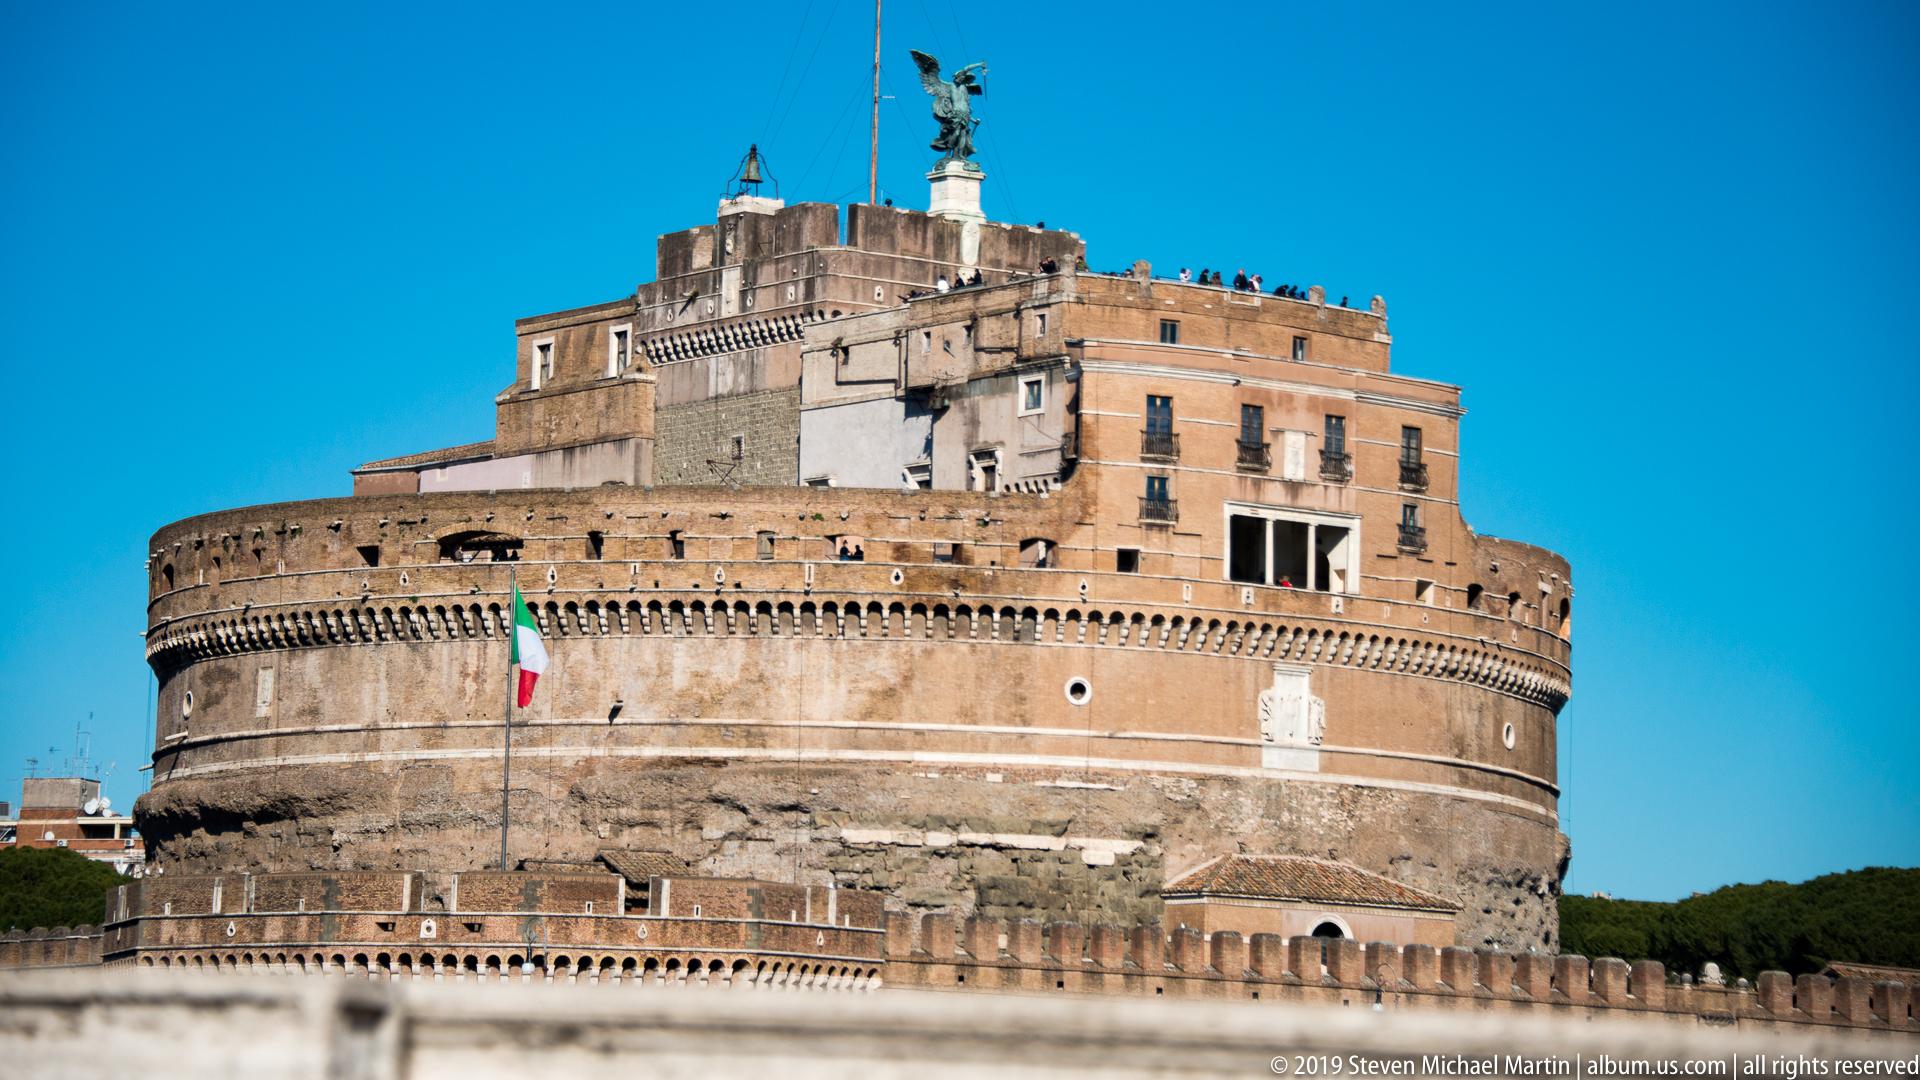 SMartin_2019 Italy Rome (72 of 128)